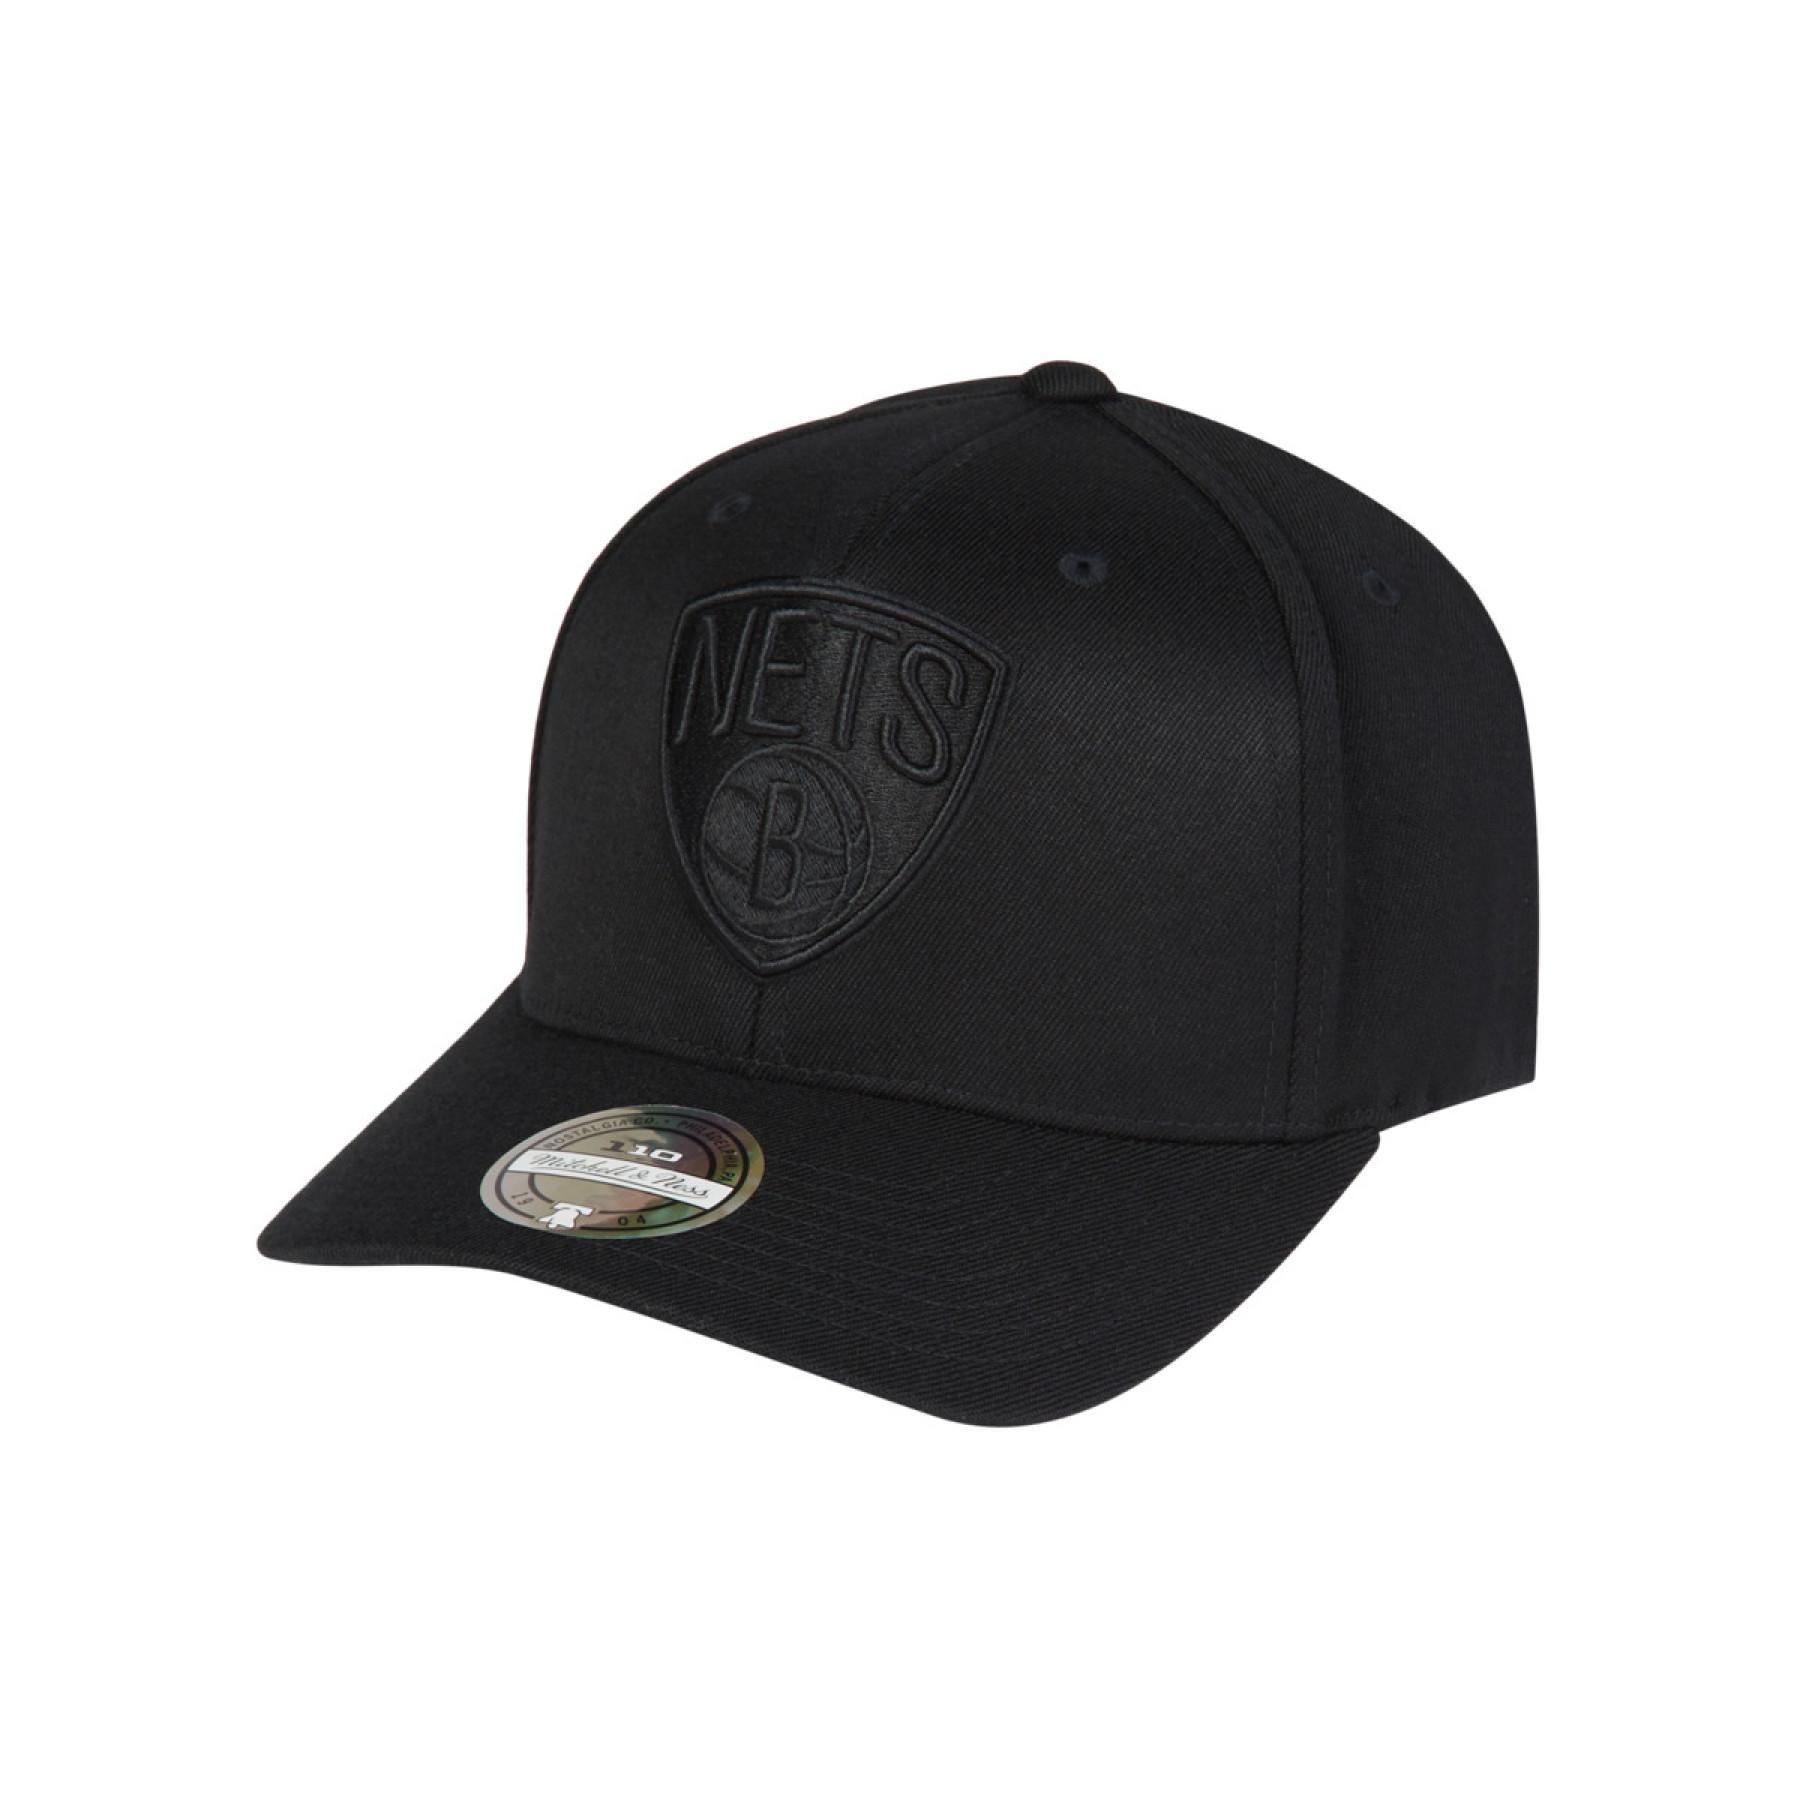 Brooklyn Nets cap blk/wht logo 110